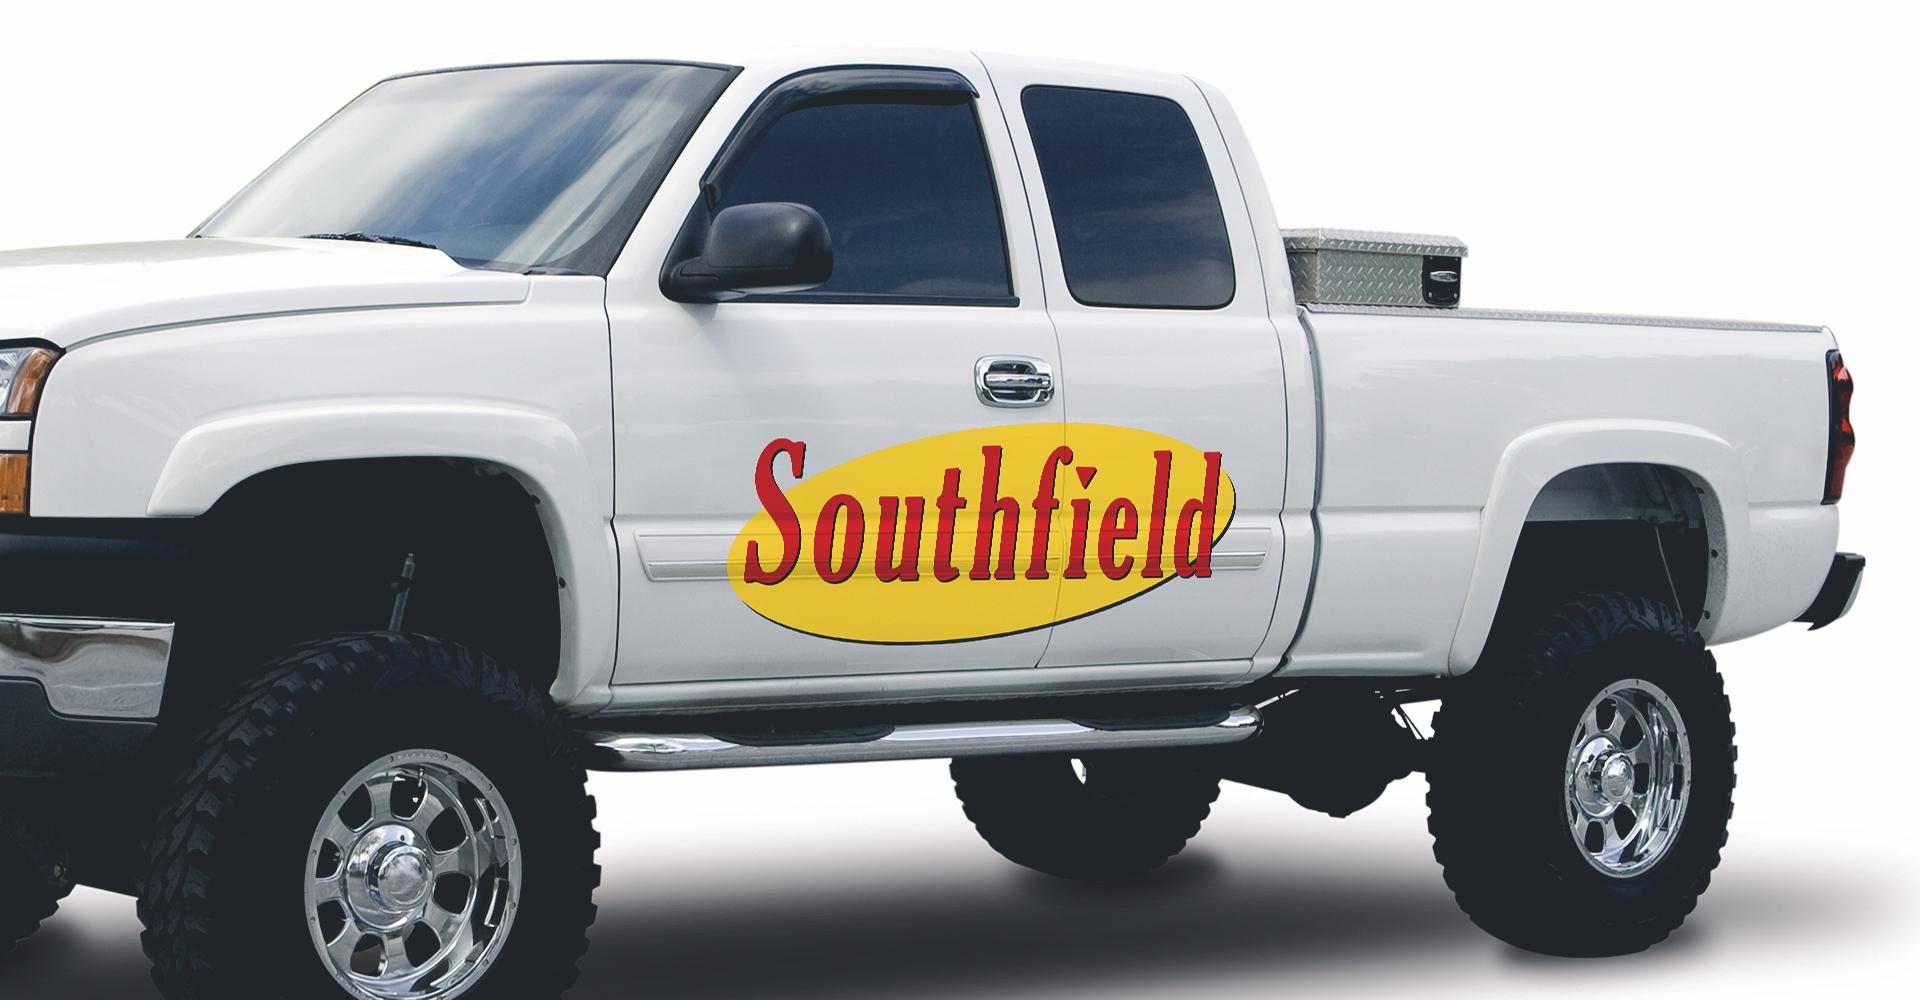 southfield.jpg